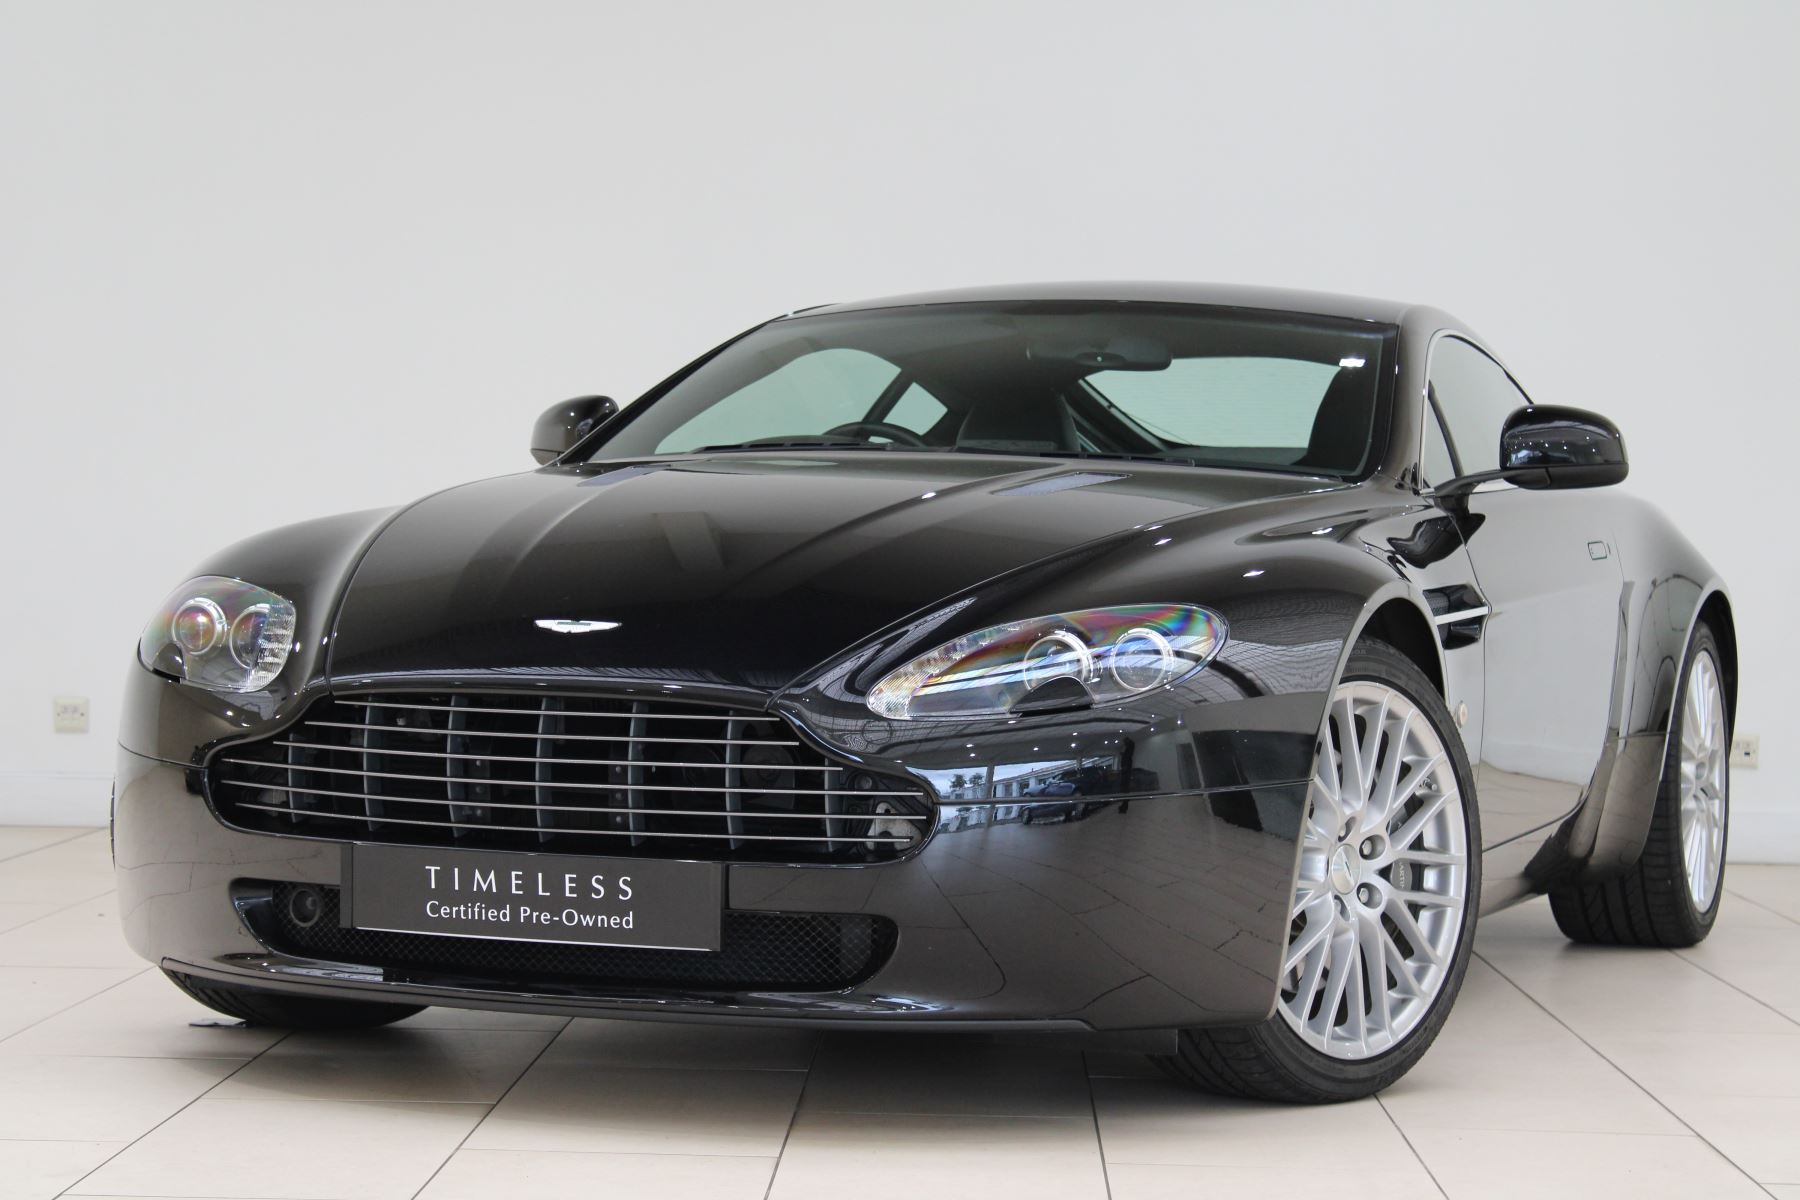 Aston Martin V8 Vantage 2dr [420] 4.7 3 door Coupe (2012)